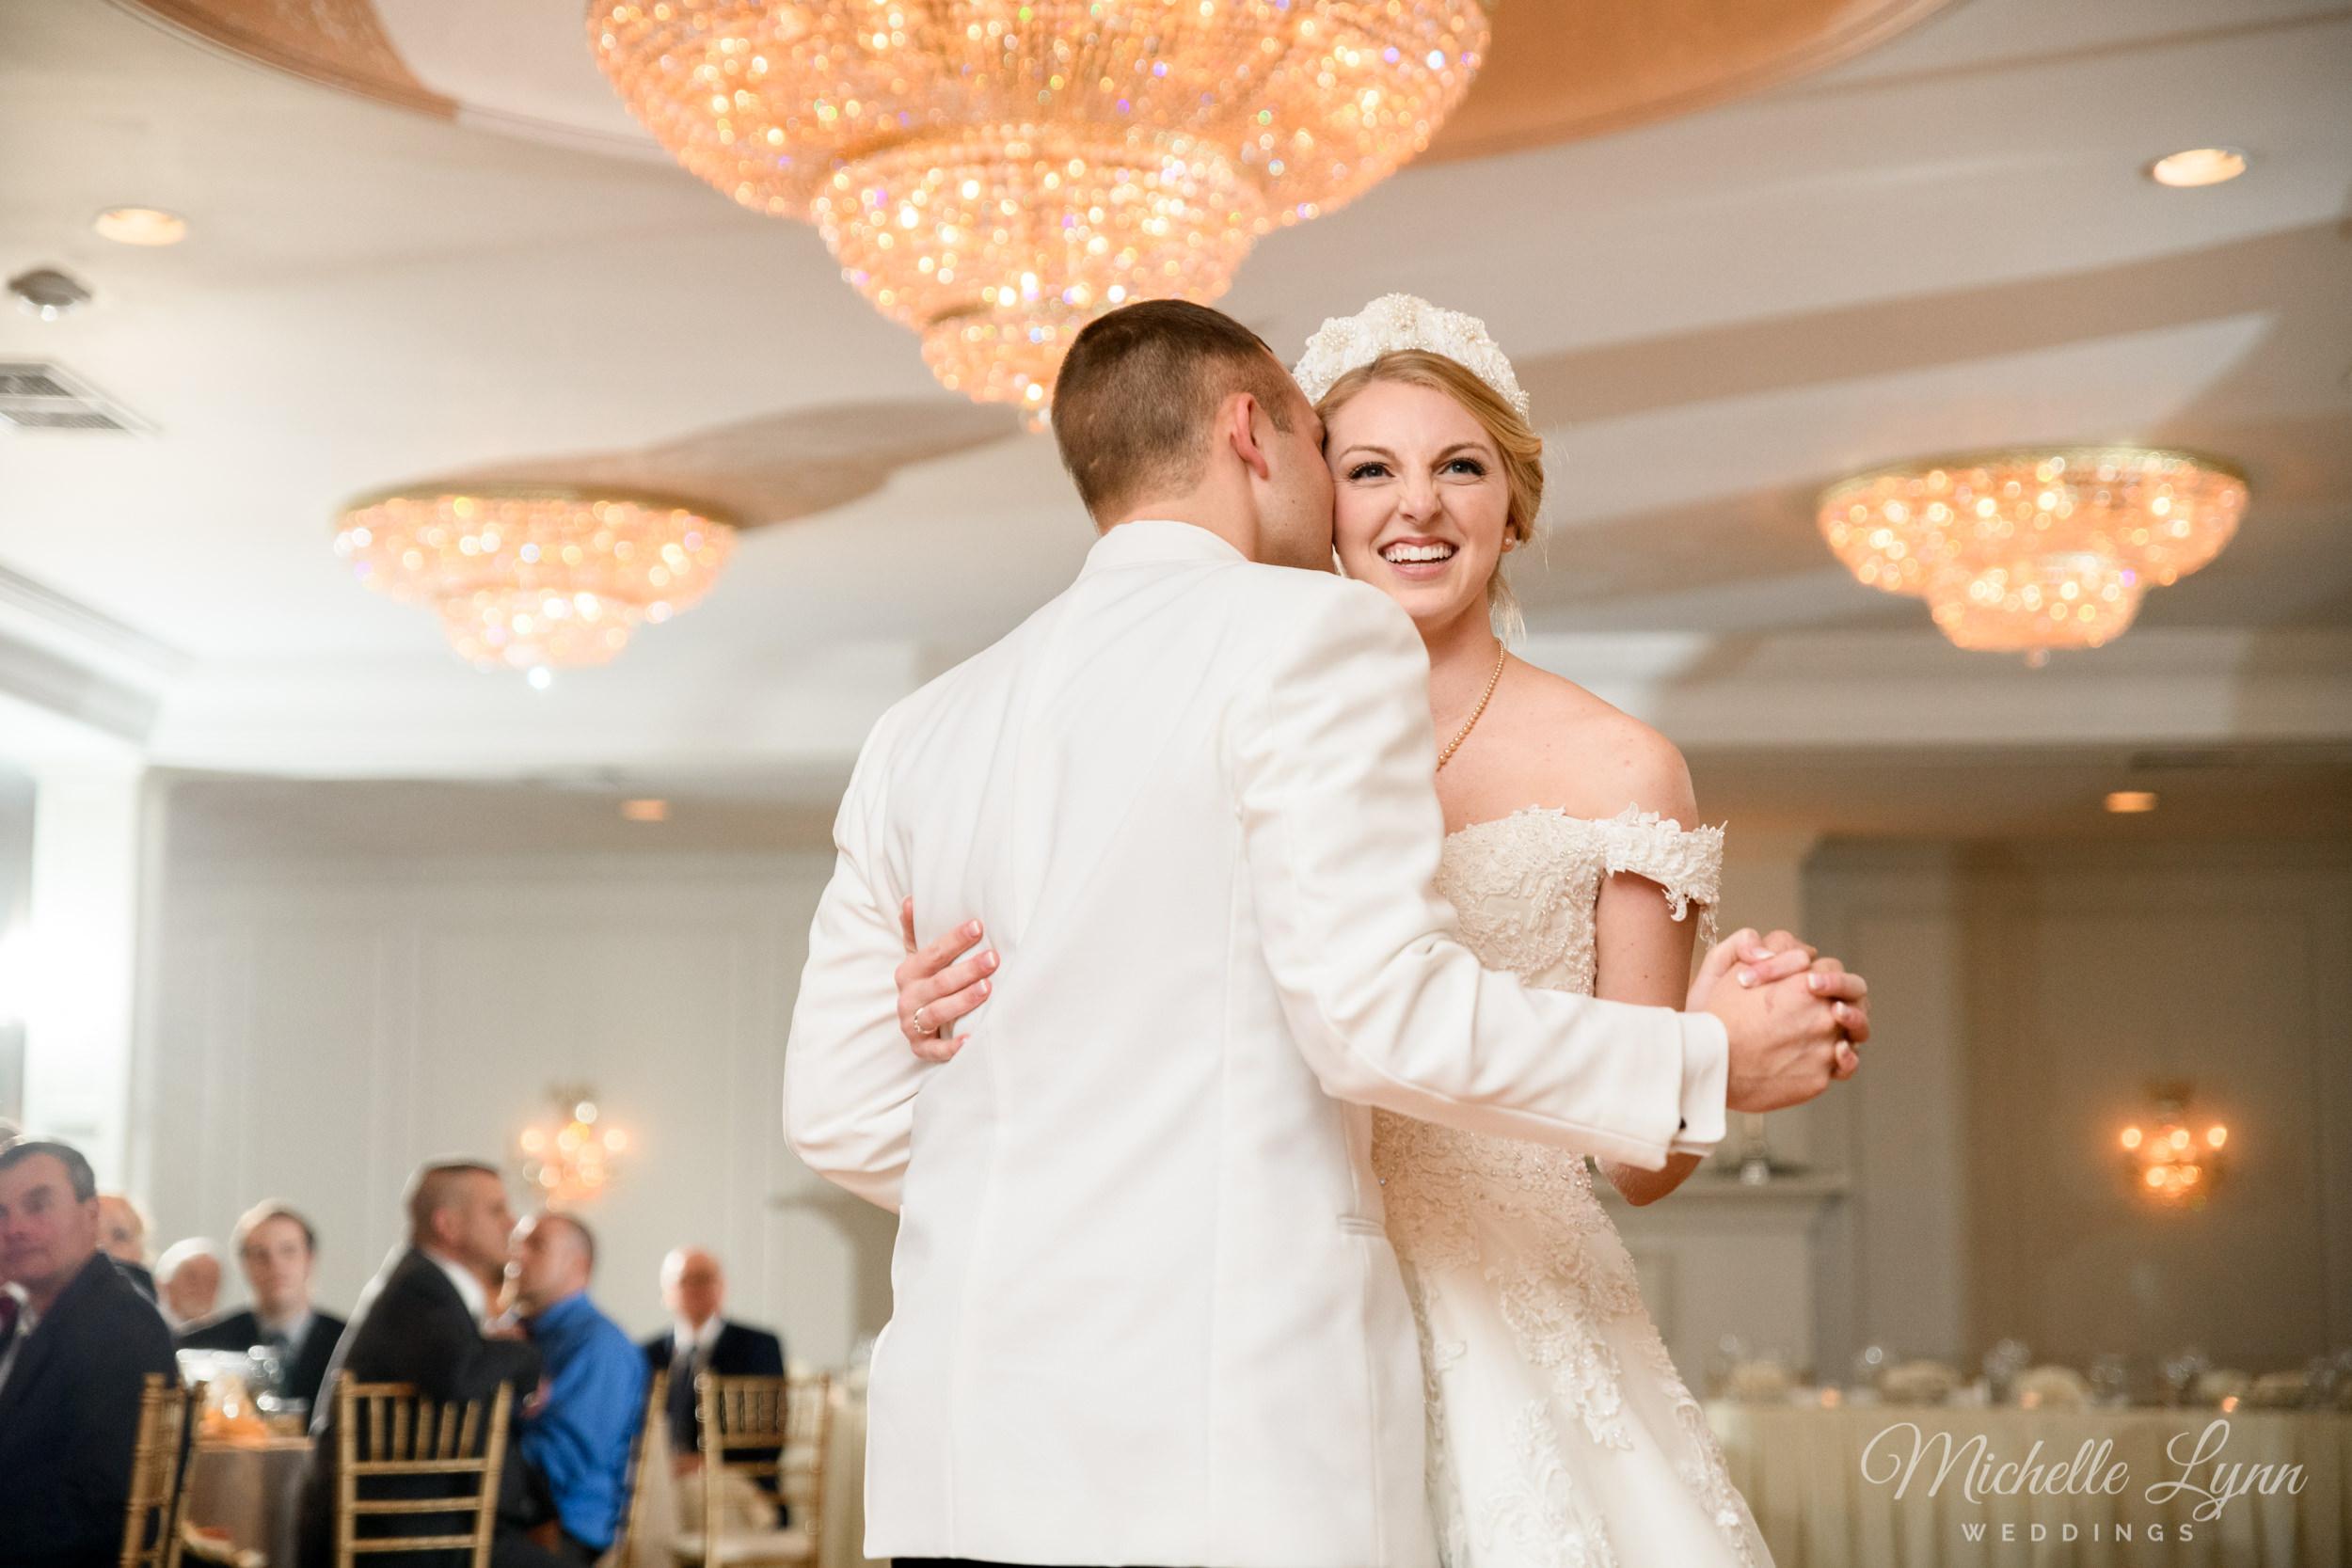 william-penn-inn-wedding-photography-mlw-81.jpg